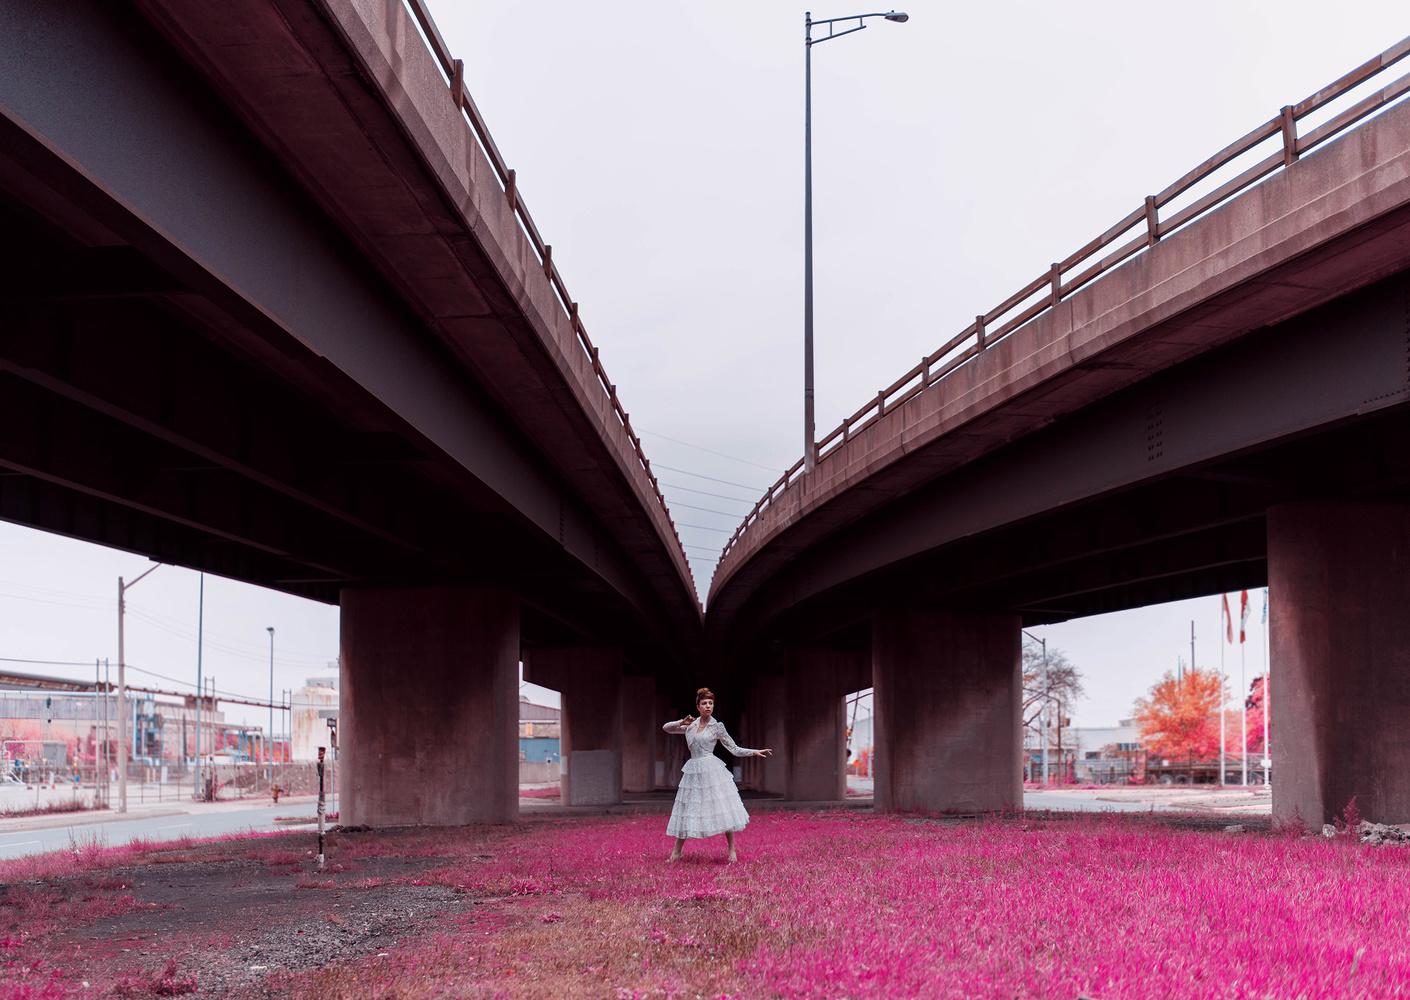 Dancer, bridge 01 by Ian Pettigrew